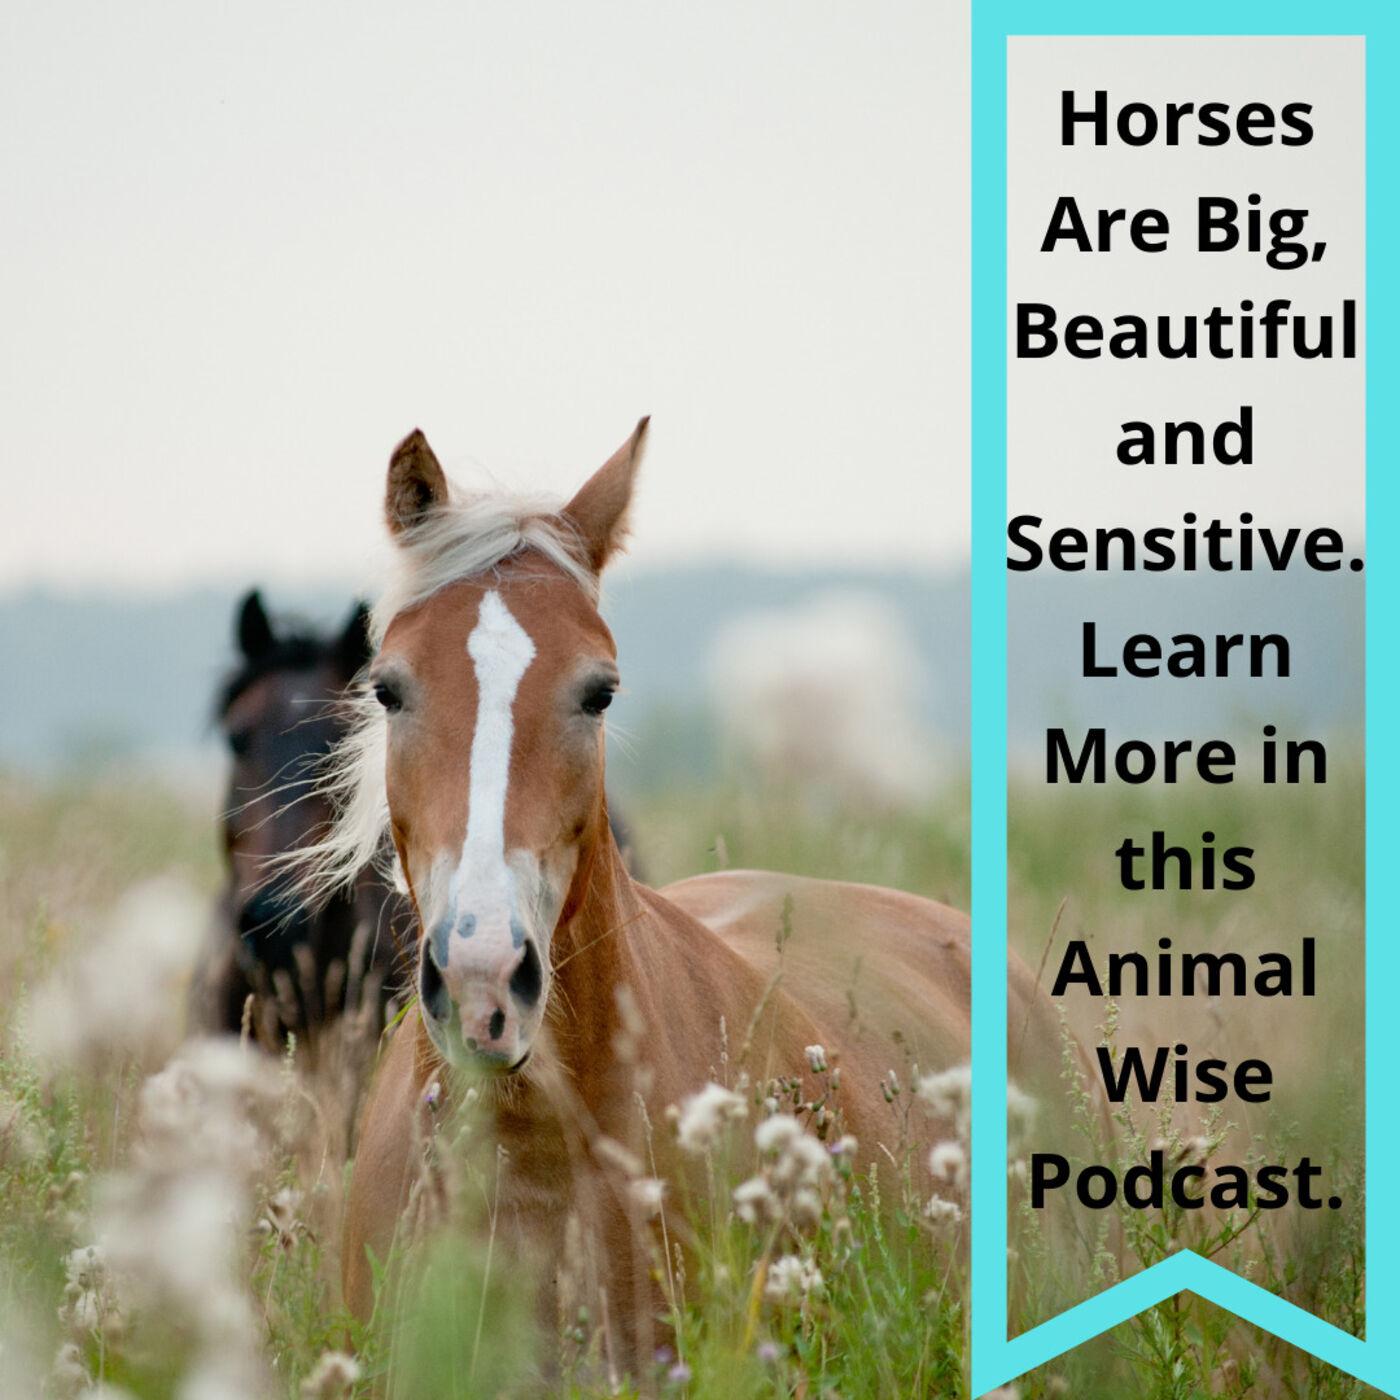 Horses Are Sensitive Too